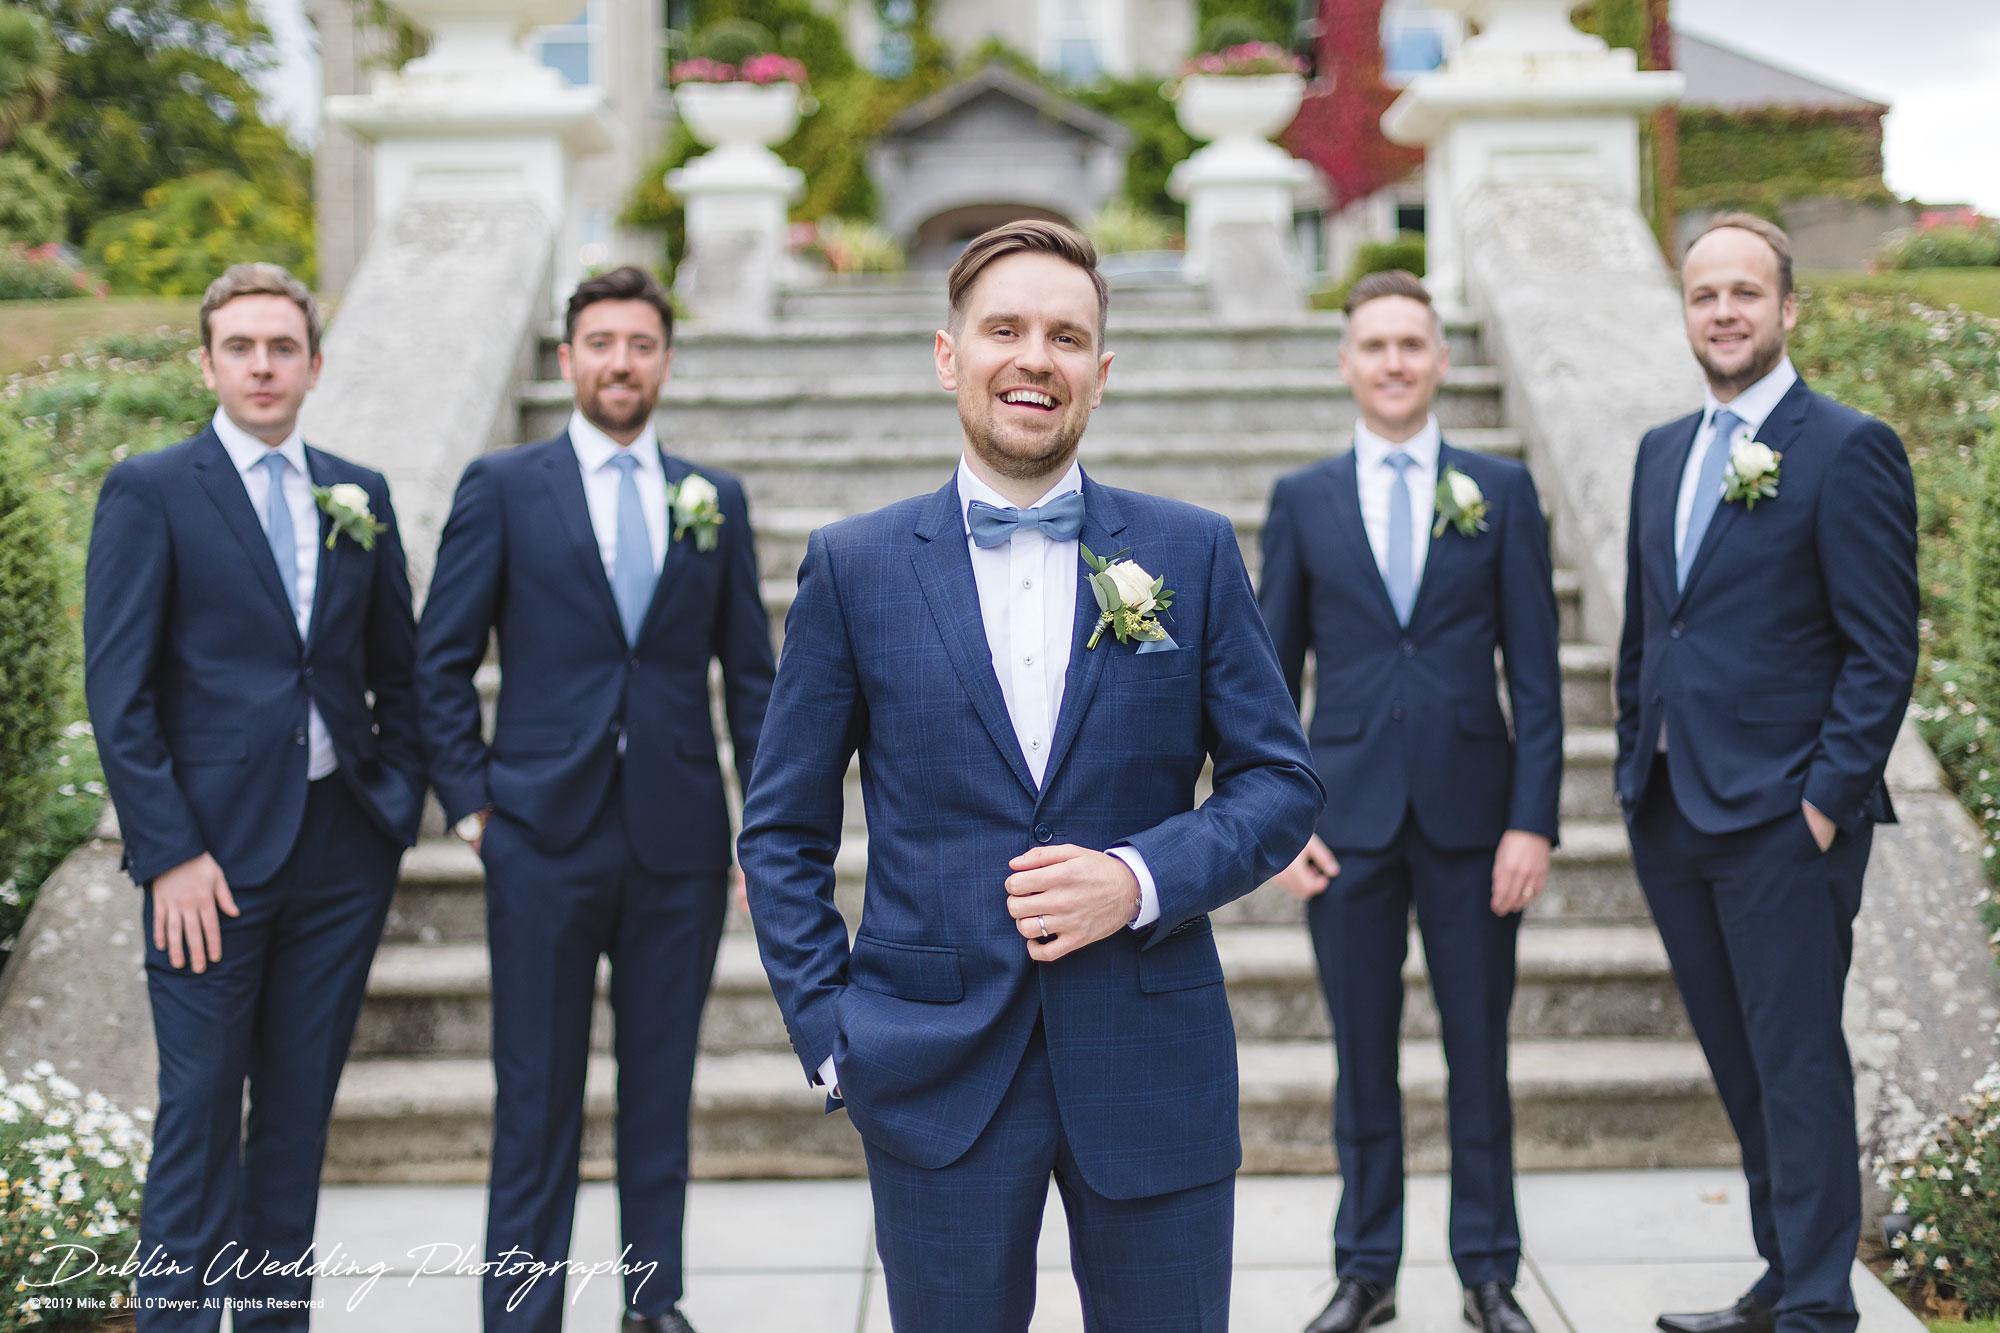 wedding-photographers-wicklow-tinakilly-house-2019-48.jpg